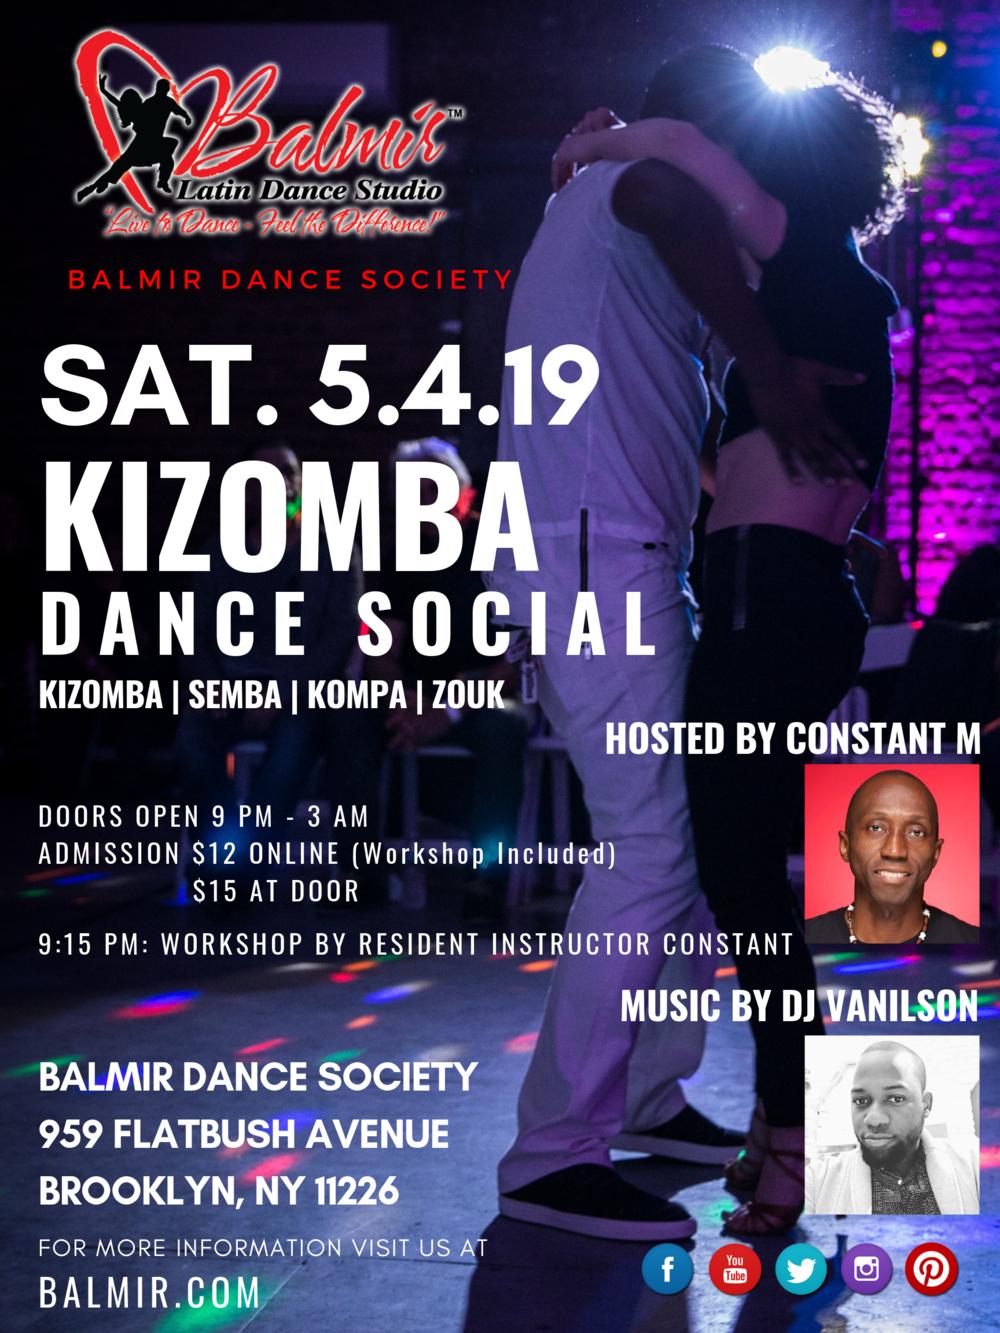 KIZOMBA SOCIAL DANCE PARTY BROOKLYN NEW YORK CITY EVENTS FUN MAY 4 2019.png